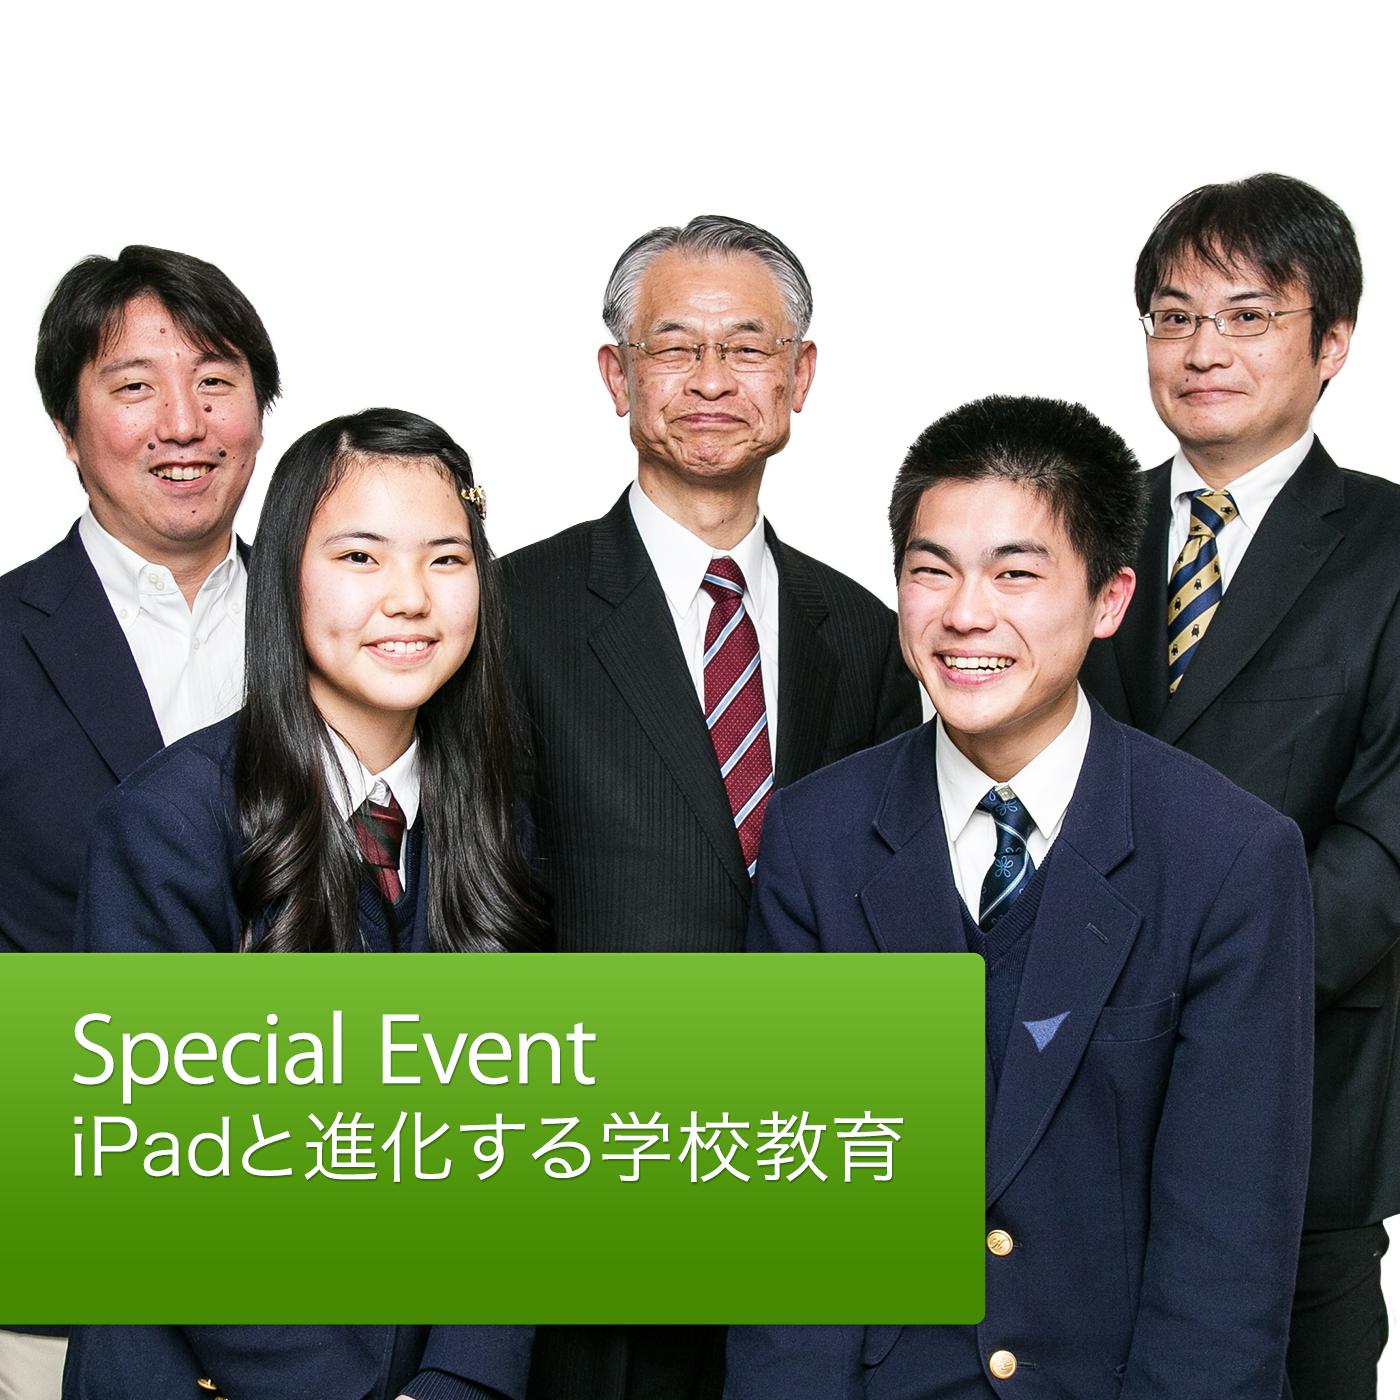 iPadと進化する学校教育 - 近畿大学附属高等学校 : Special Event